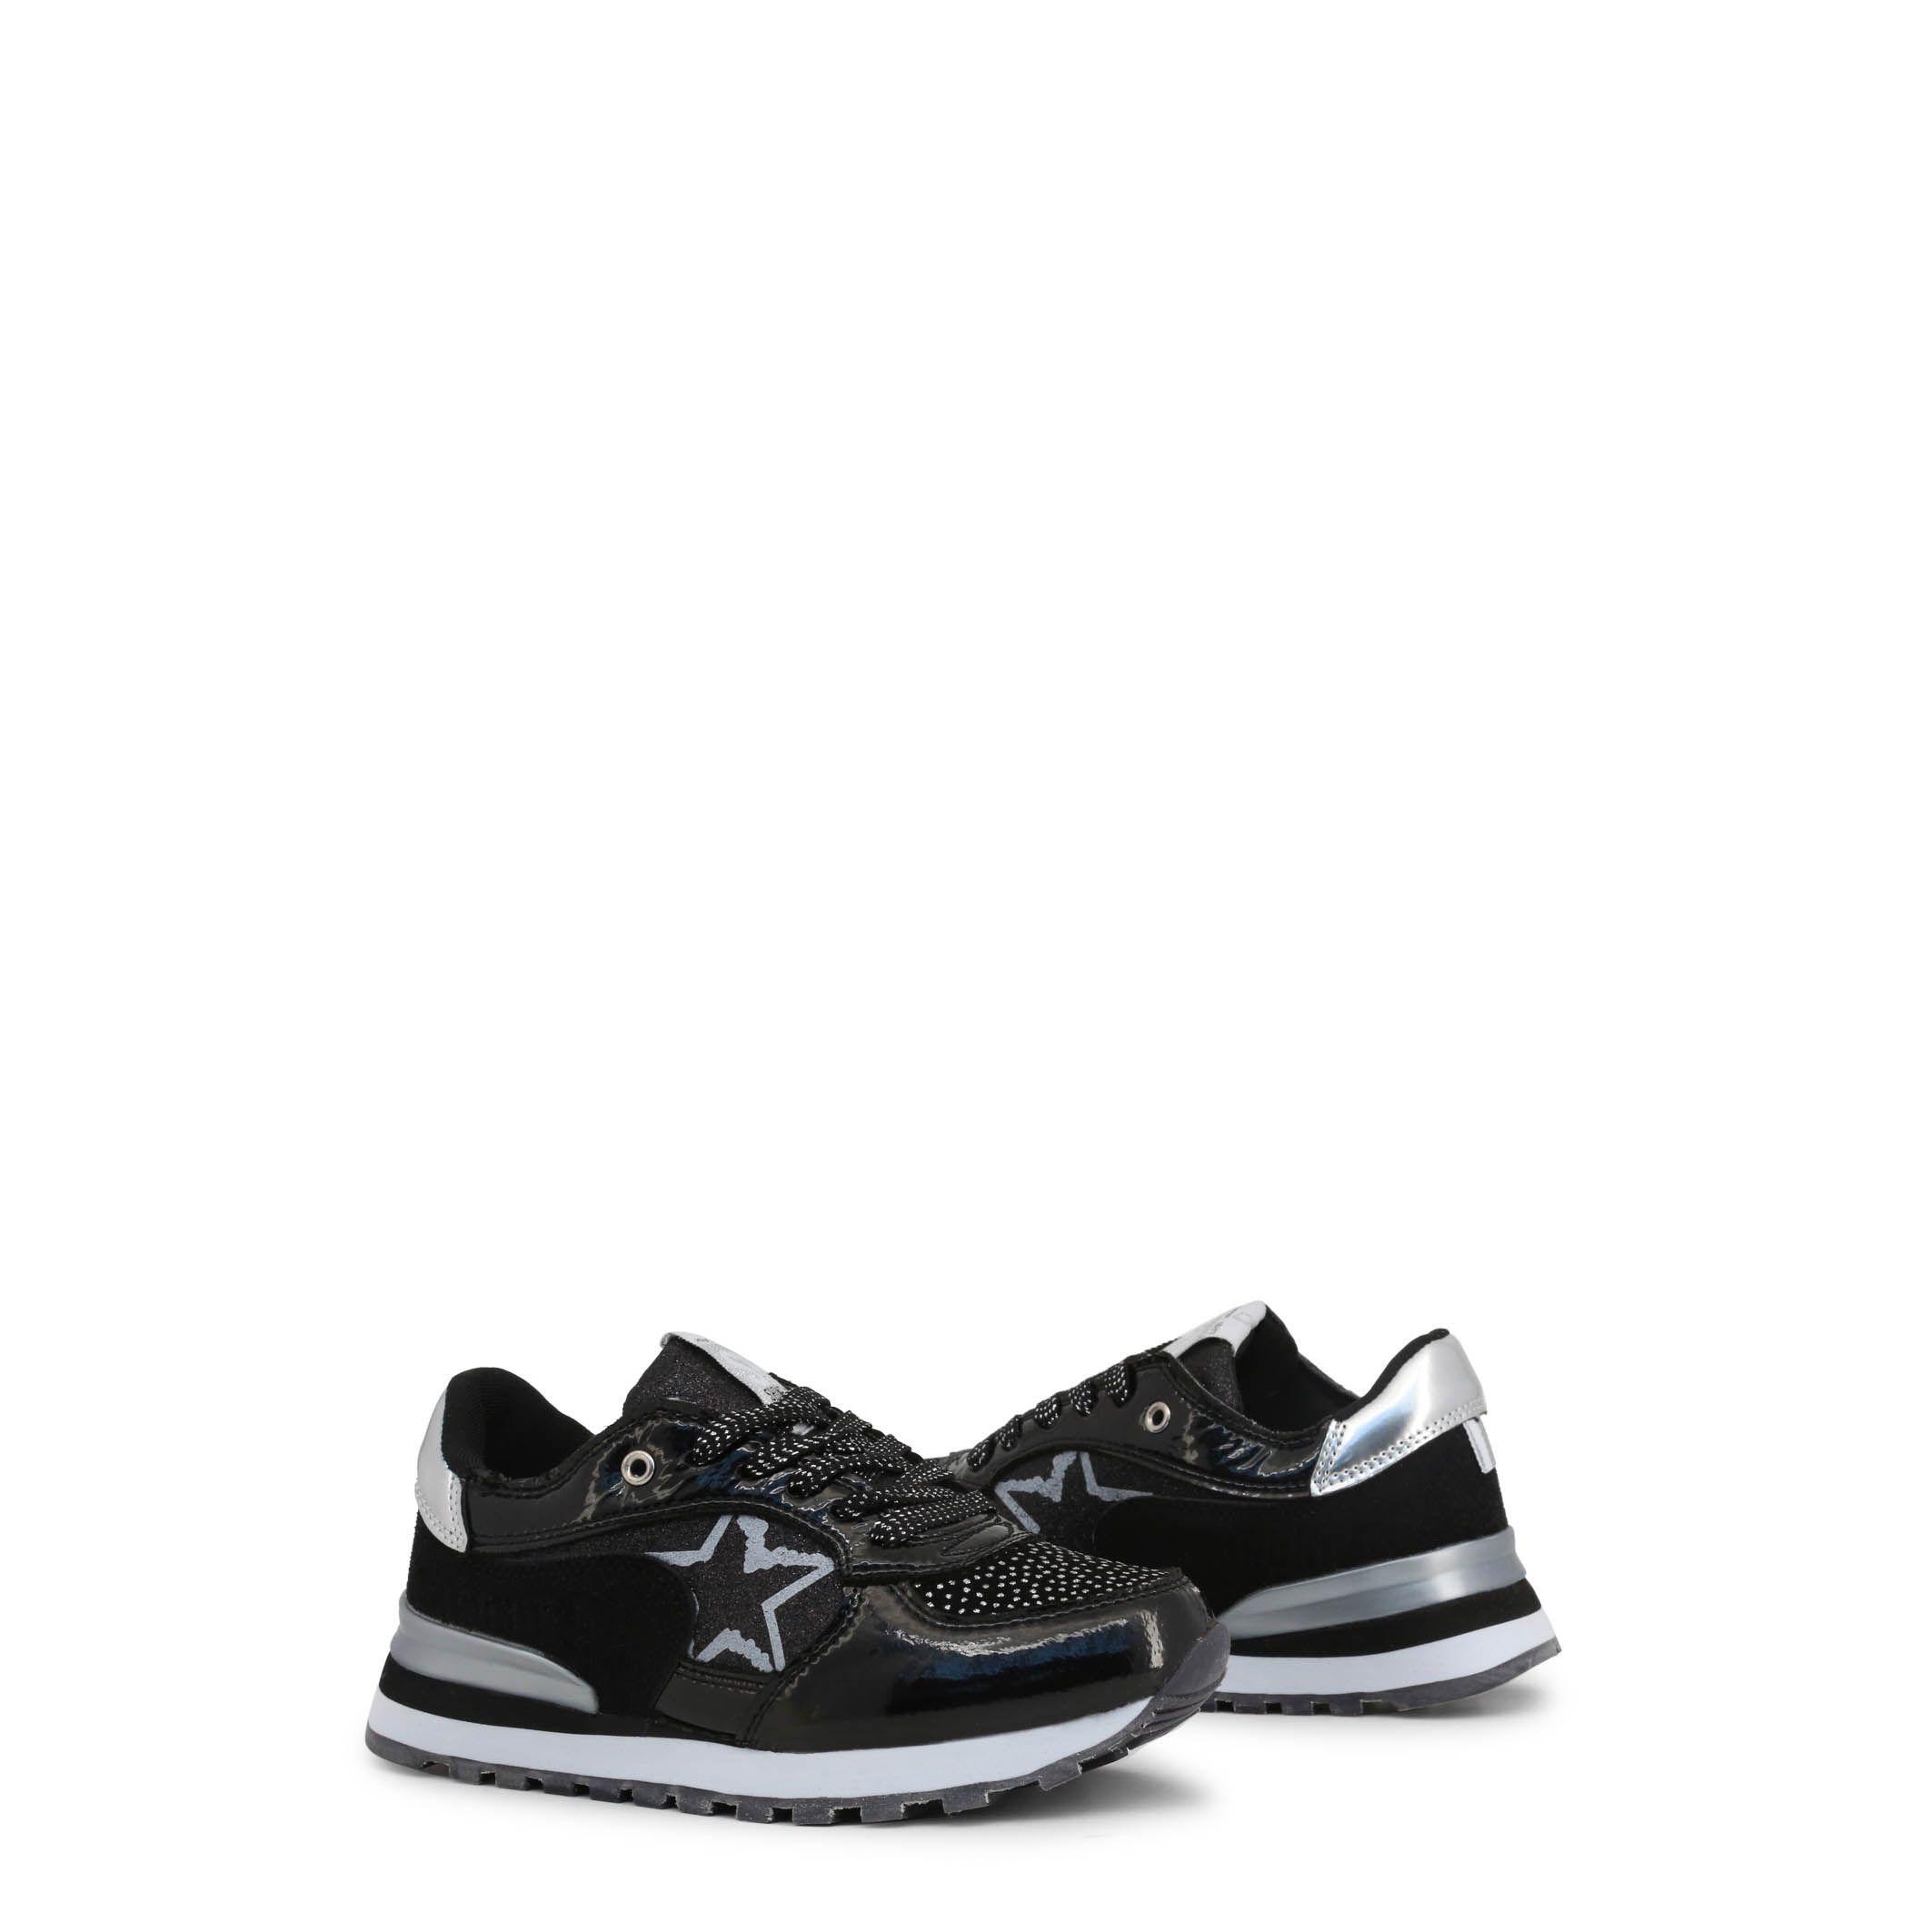 Chaussures Shone – 617K-013